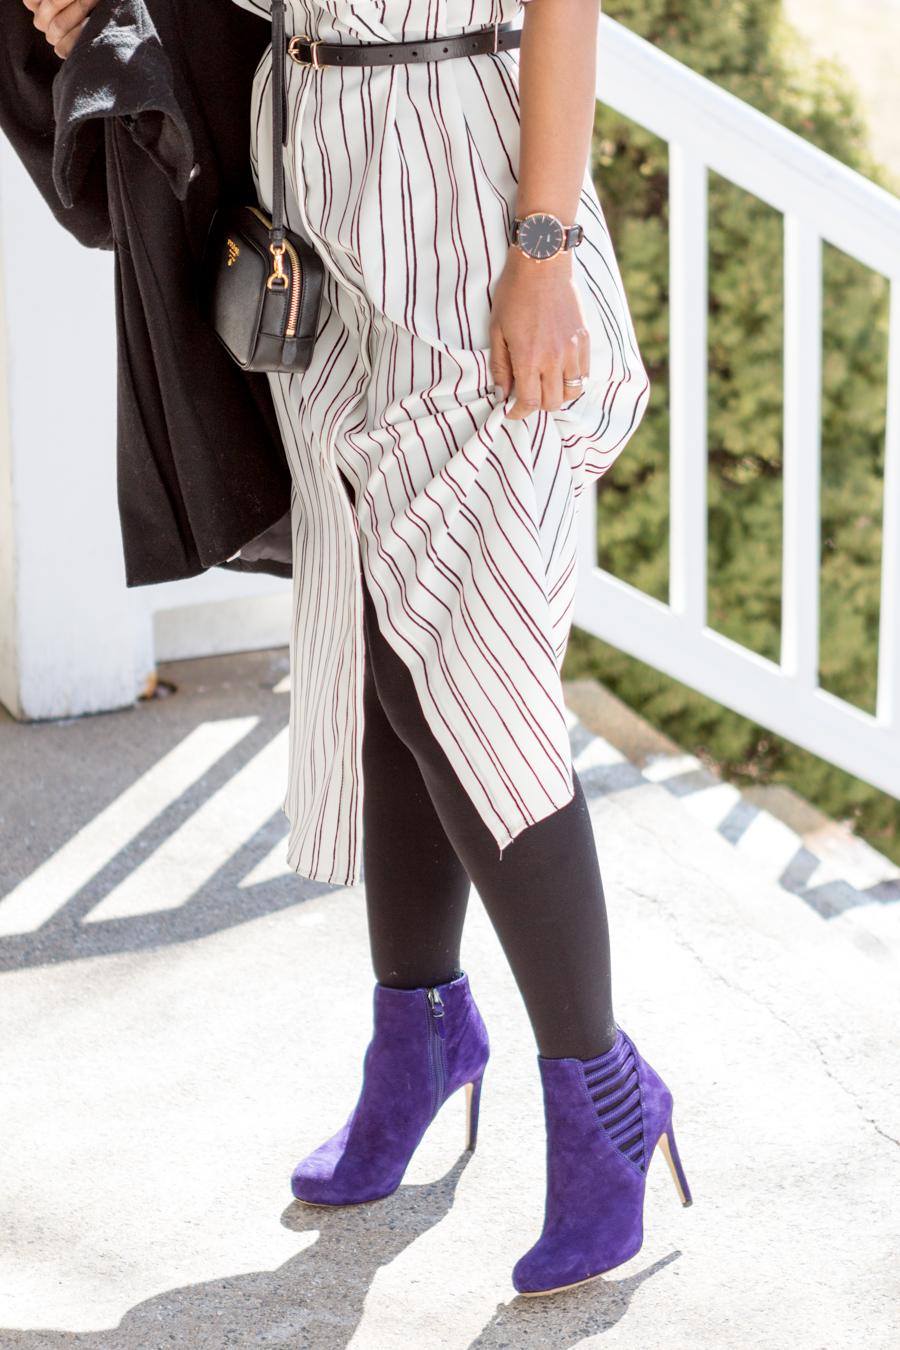 shirtdress, pinstripe, silky dress, midi, booties, via spiga, cluse watch, prada camera bag, black trench, belted dress